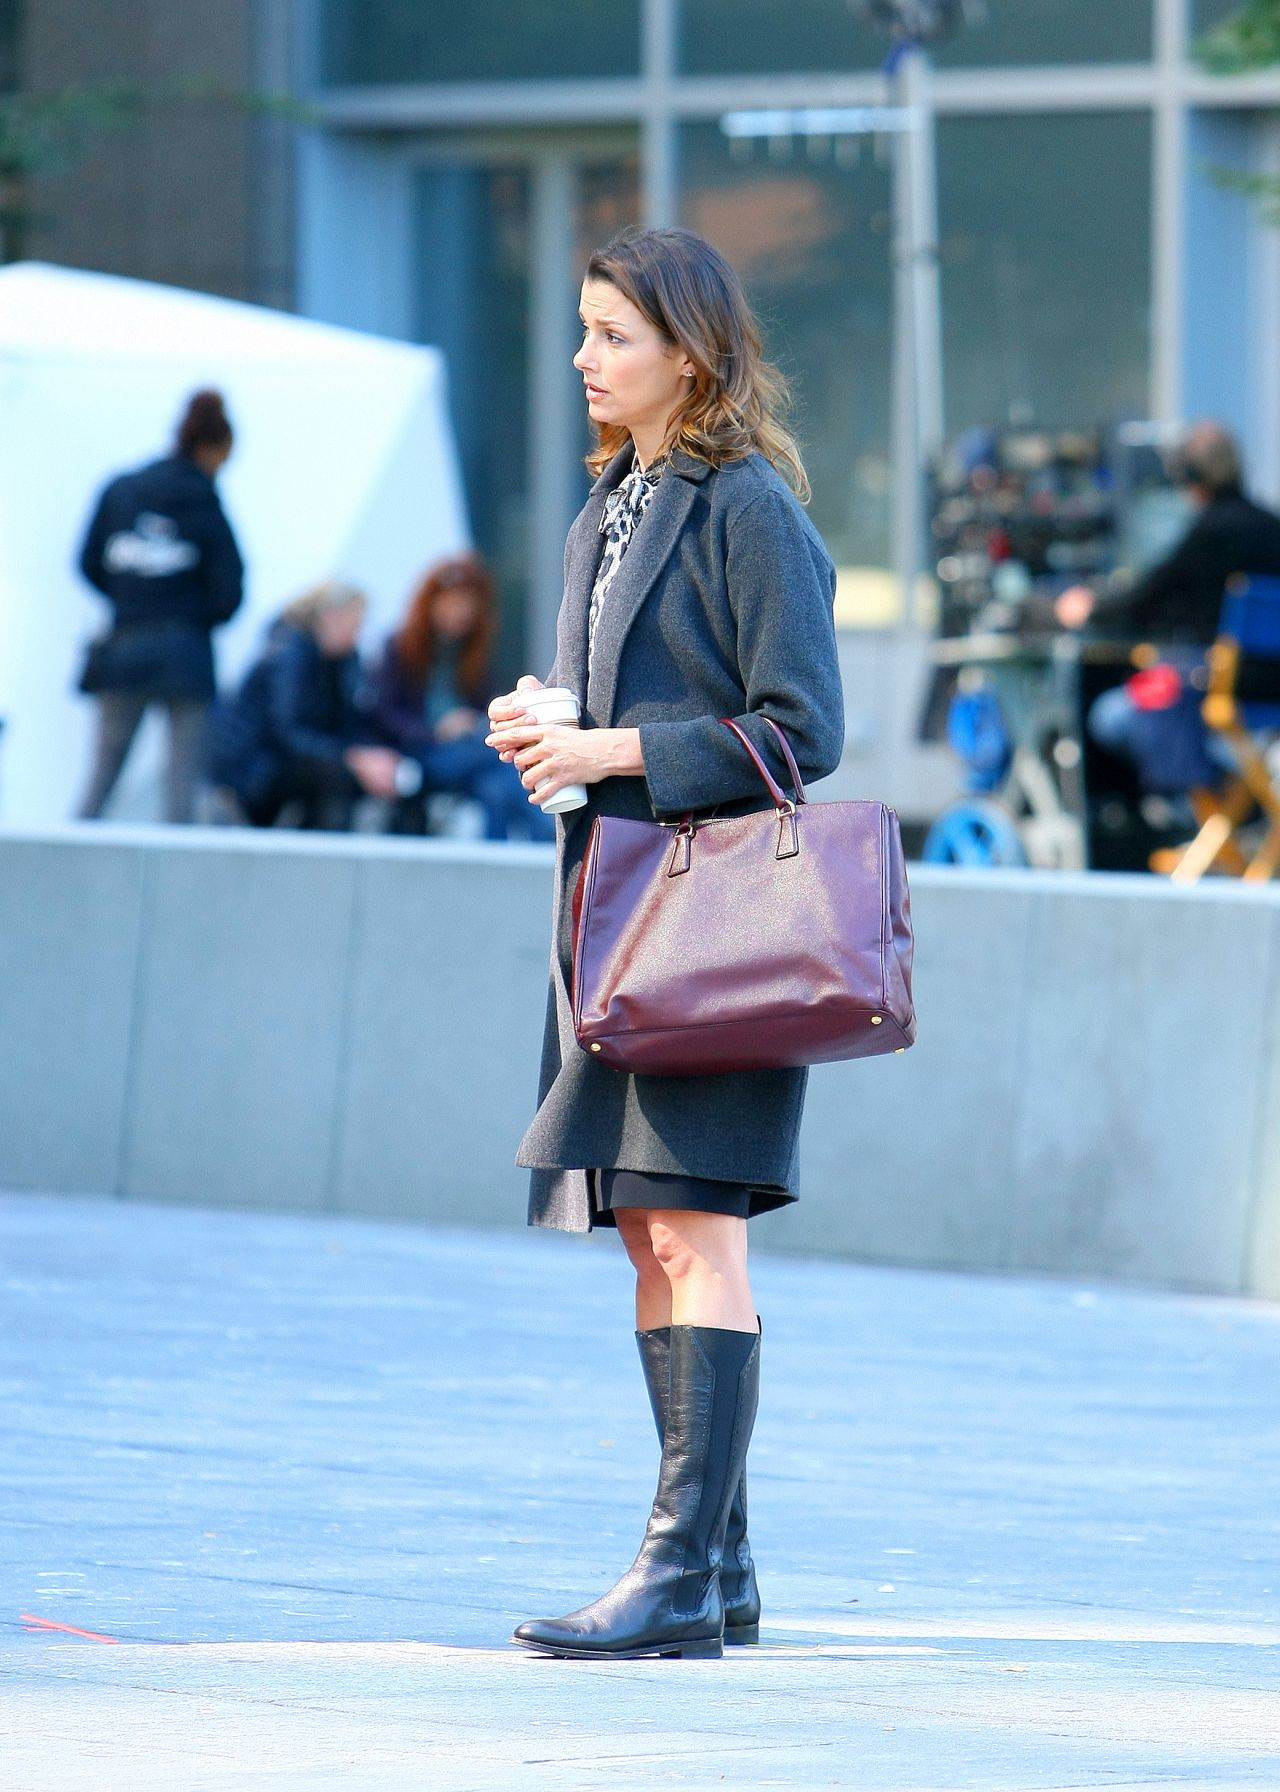 Bridget Moynahan - Filming